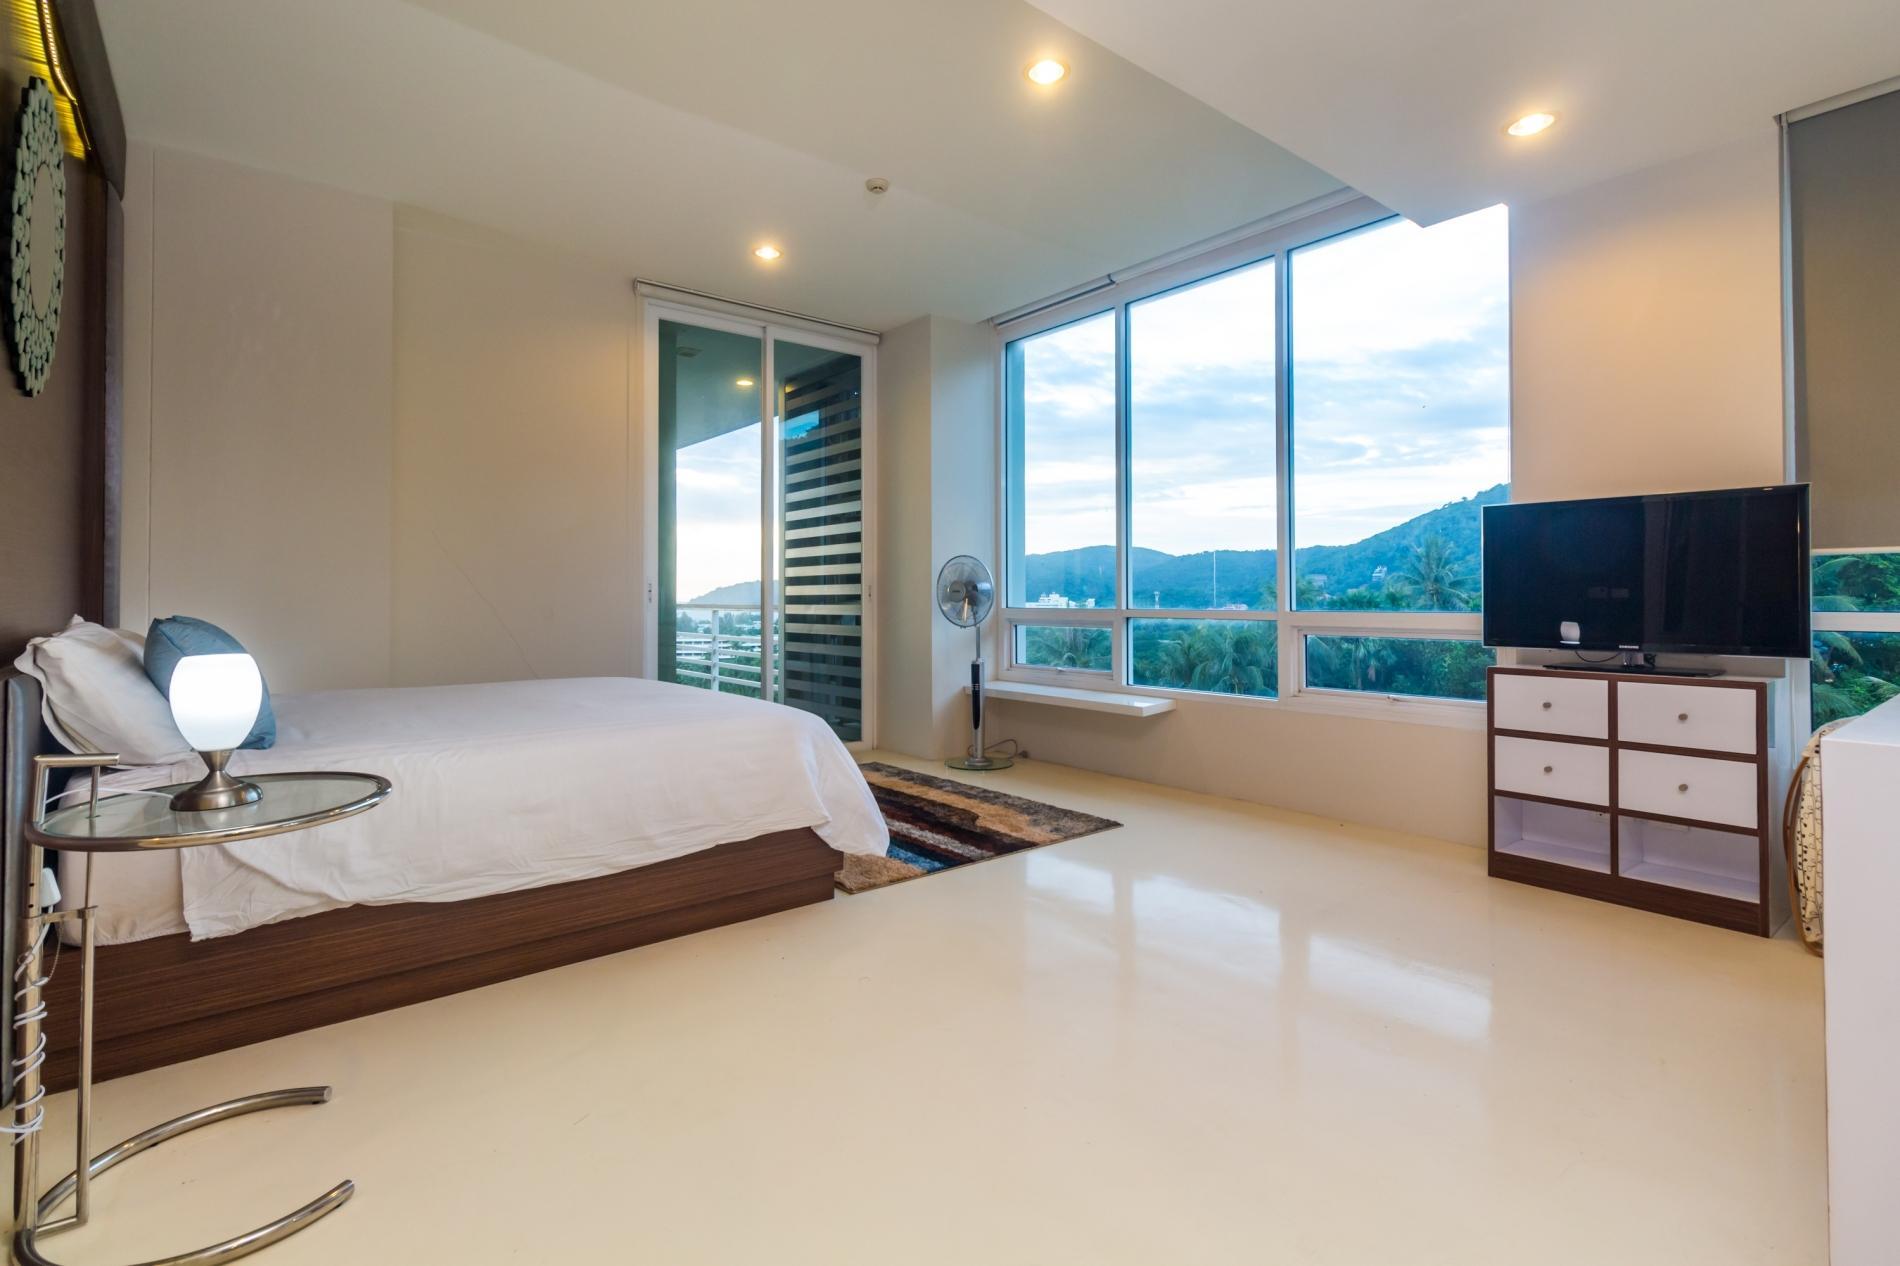 Apartment KH2605 - Sea-view Penthouse in Karon  walk to beach  restaurants  bars  shops photo 18773363